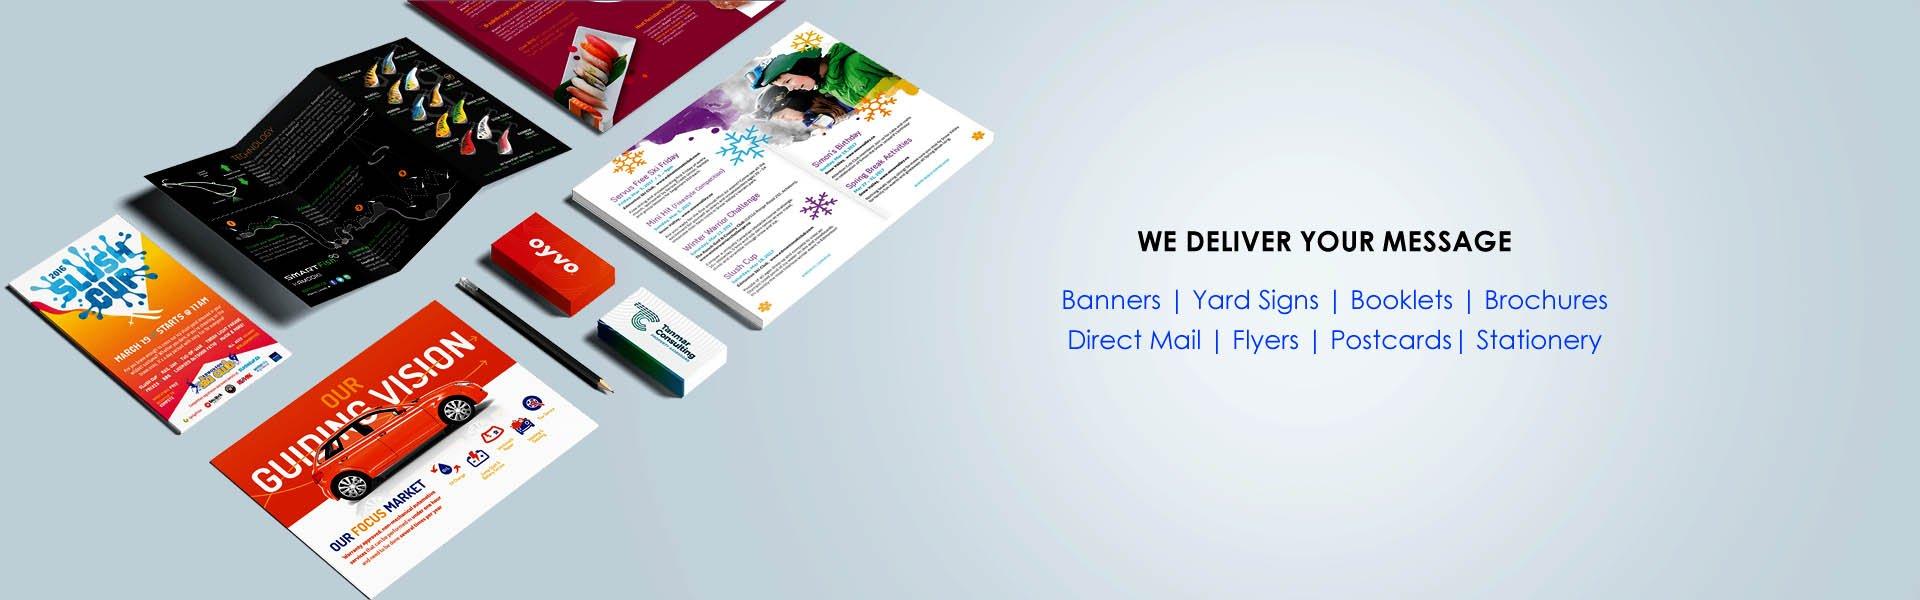 Boston Printing Services